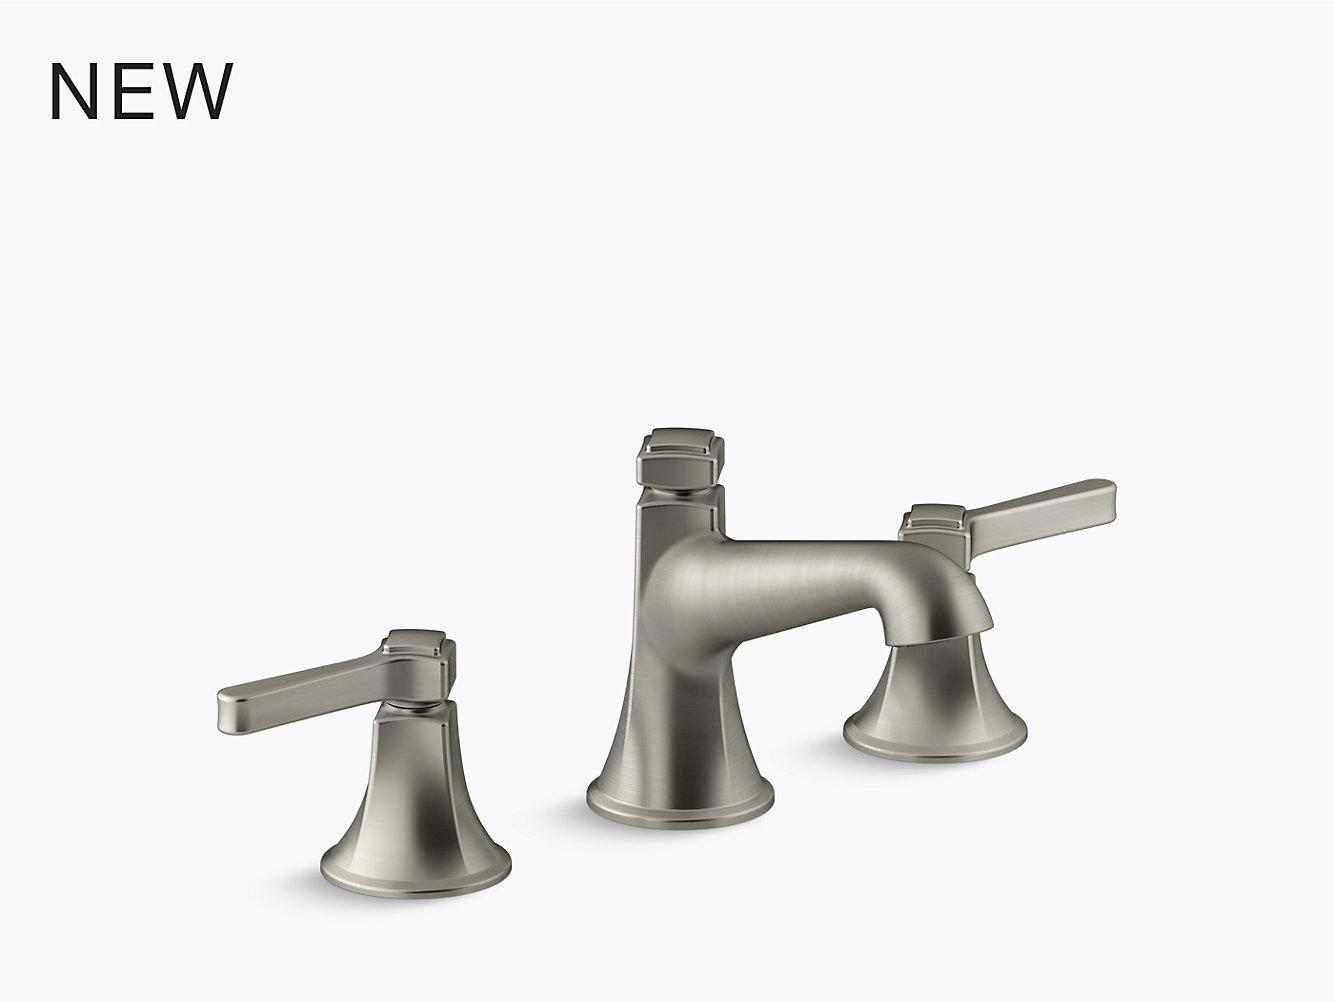 k 7337 4 hirise deck mount bridge kitchen sink faucet kohler view larger